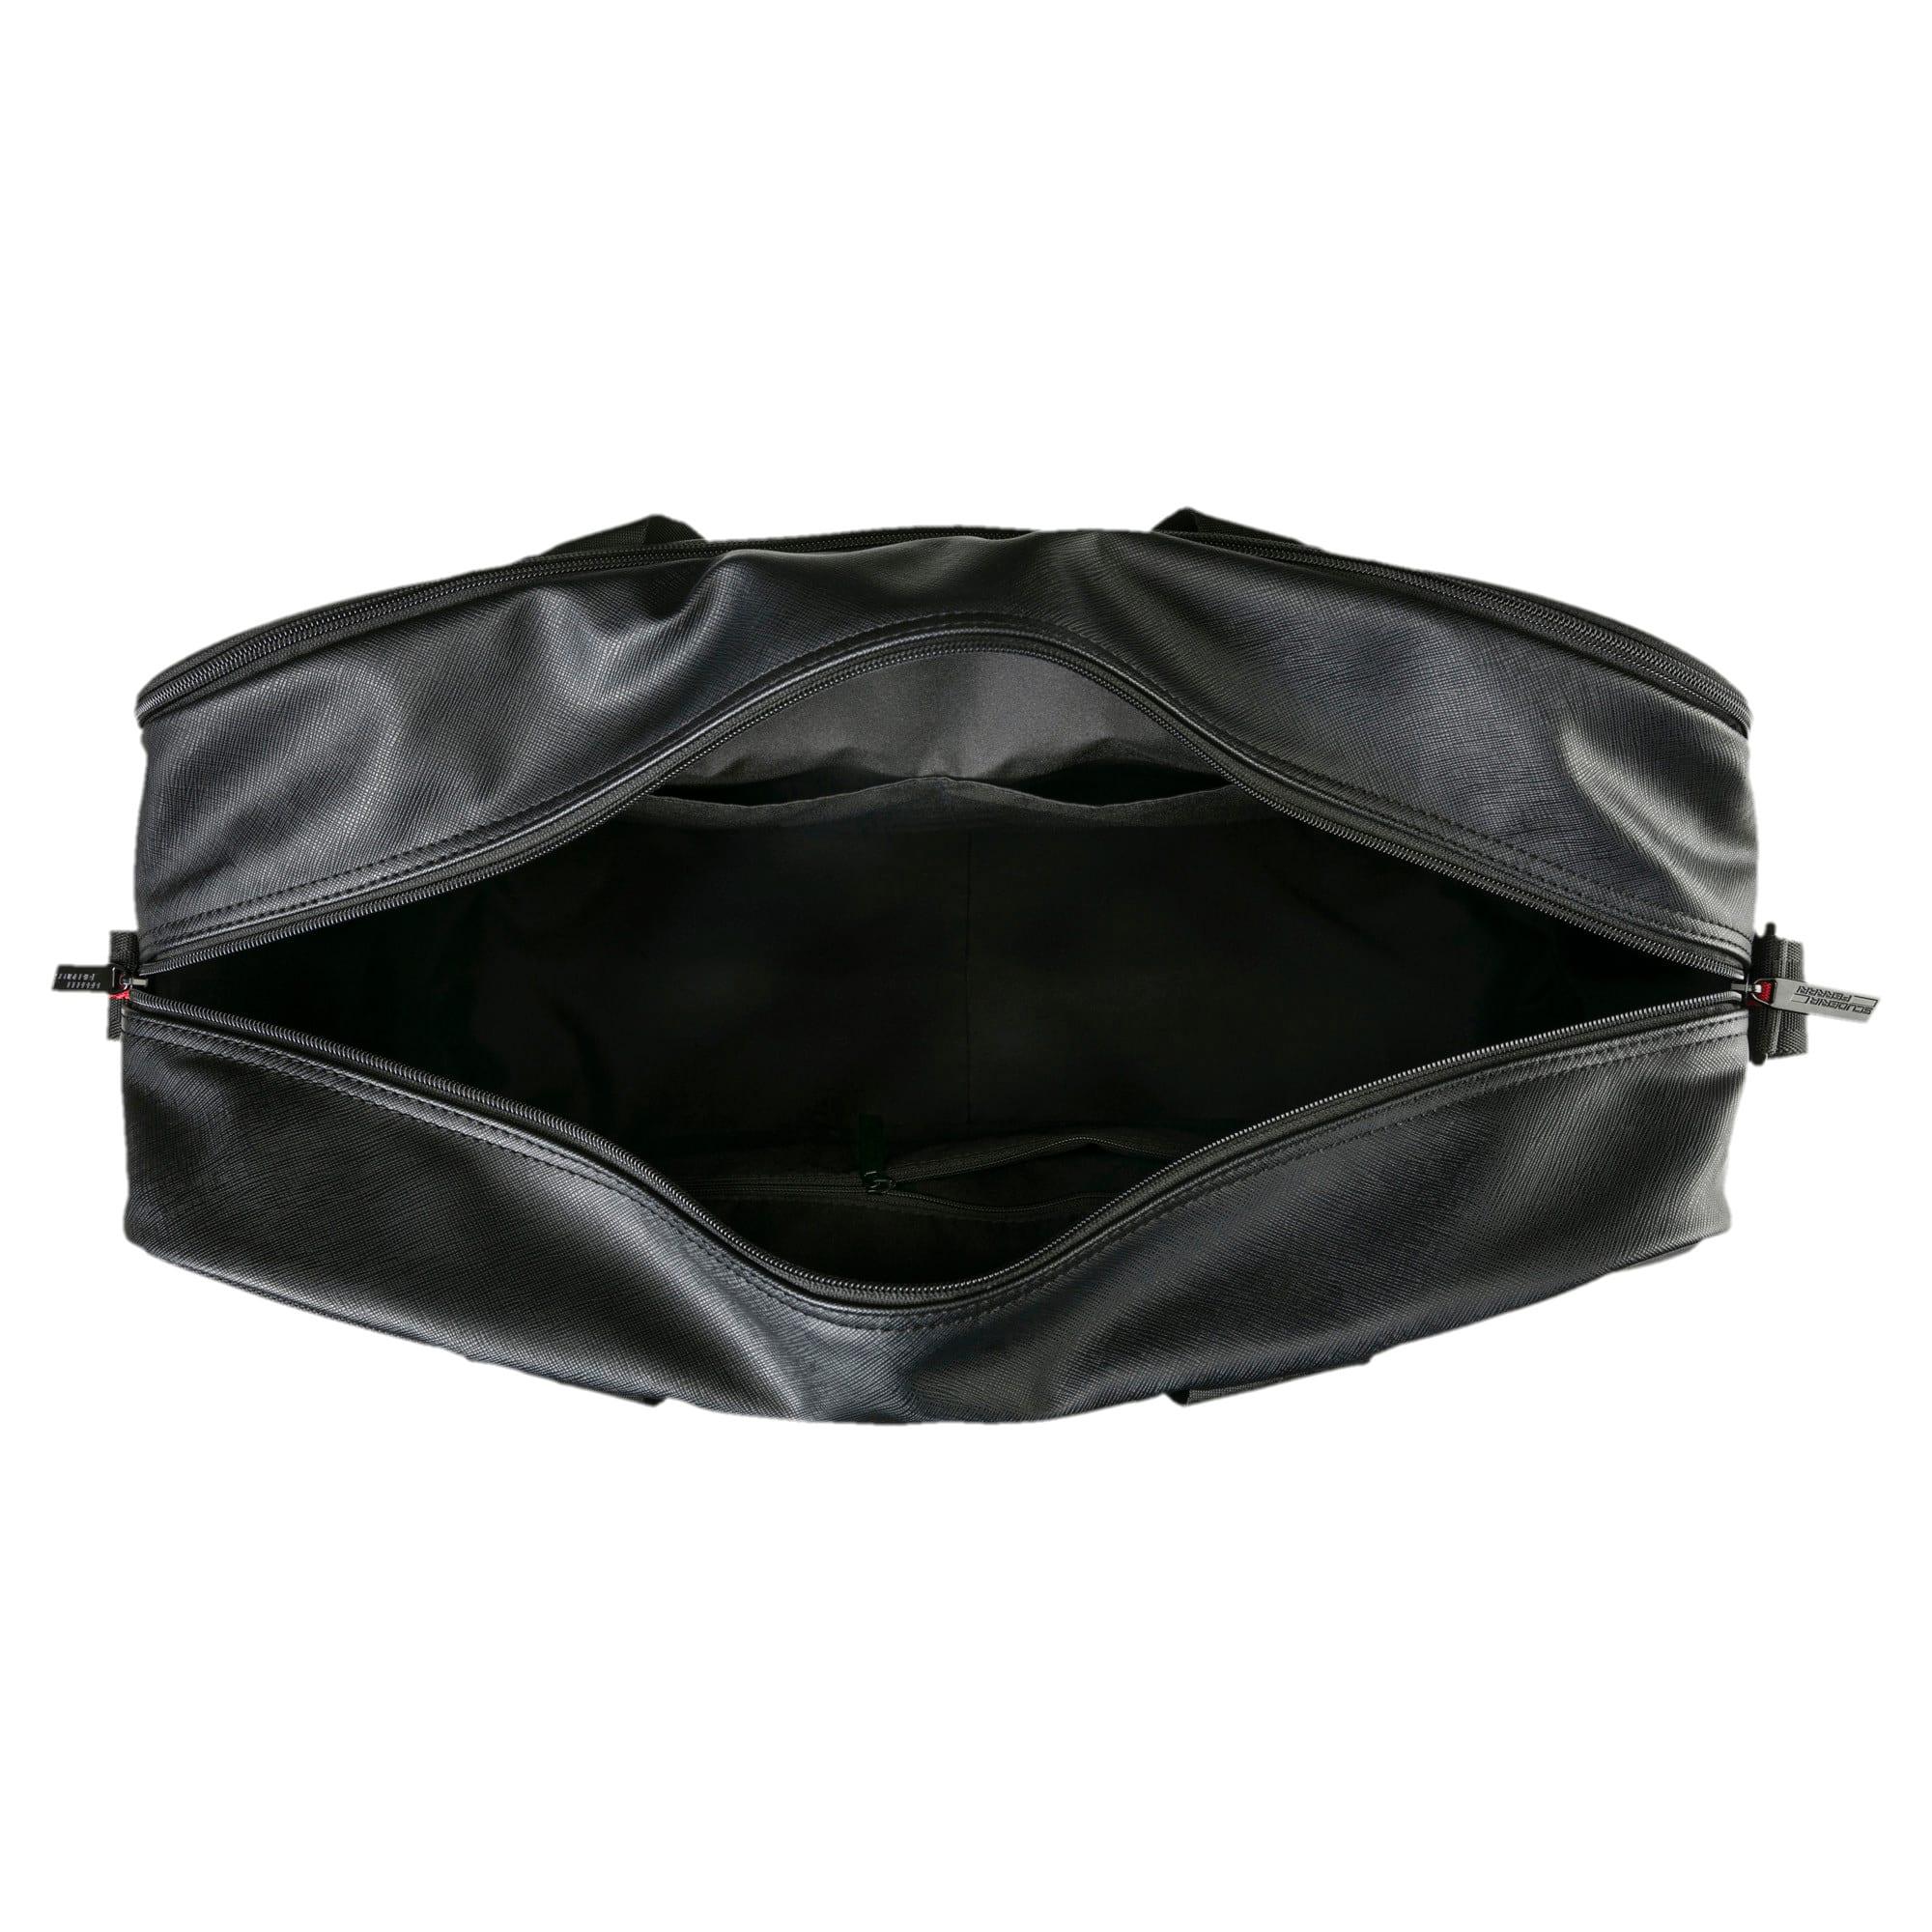 Thumbnail 3 of Ferrari Lifestyle Weekender Bag, Puma Black, medium-IND